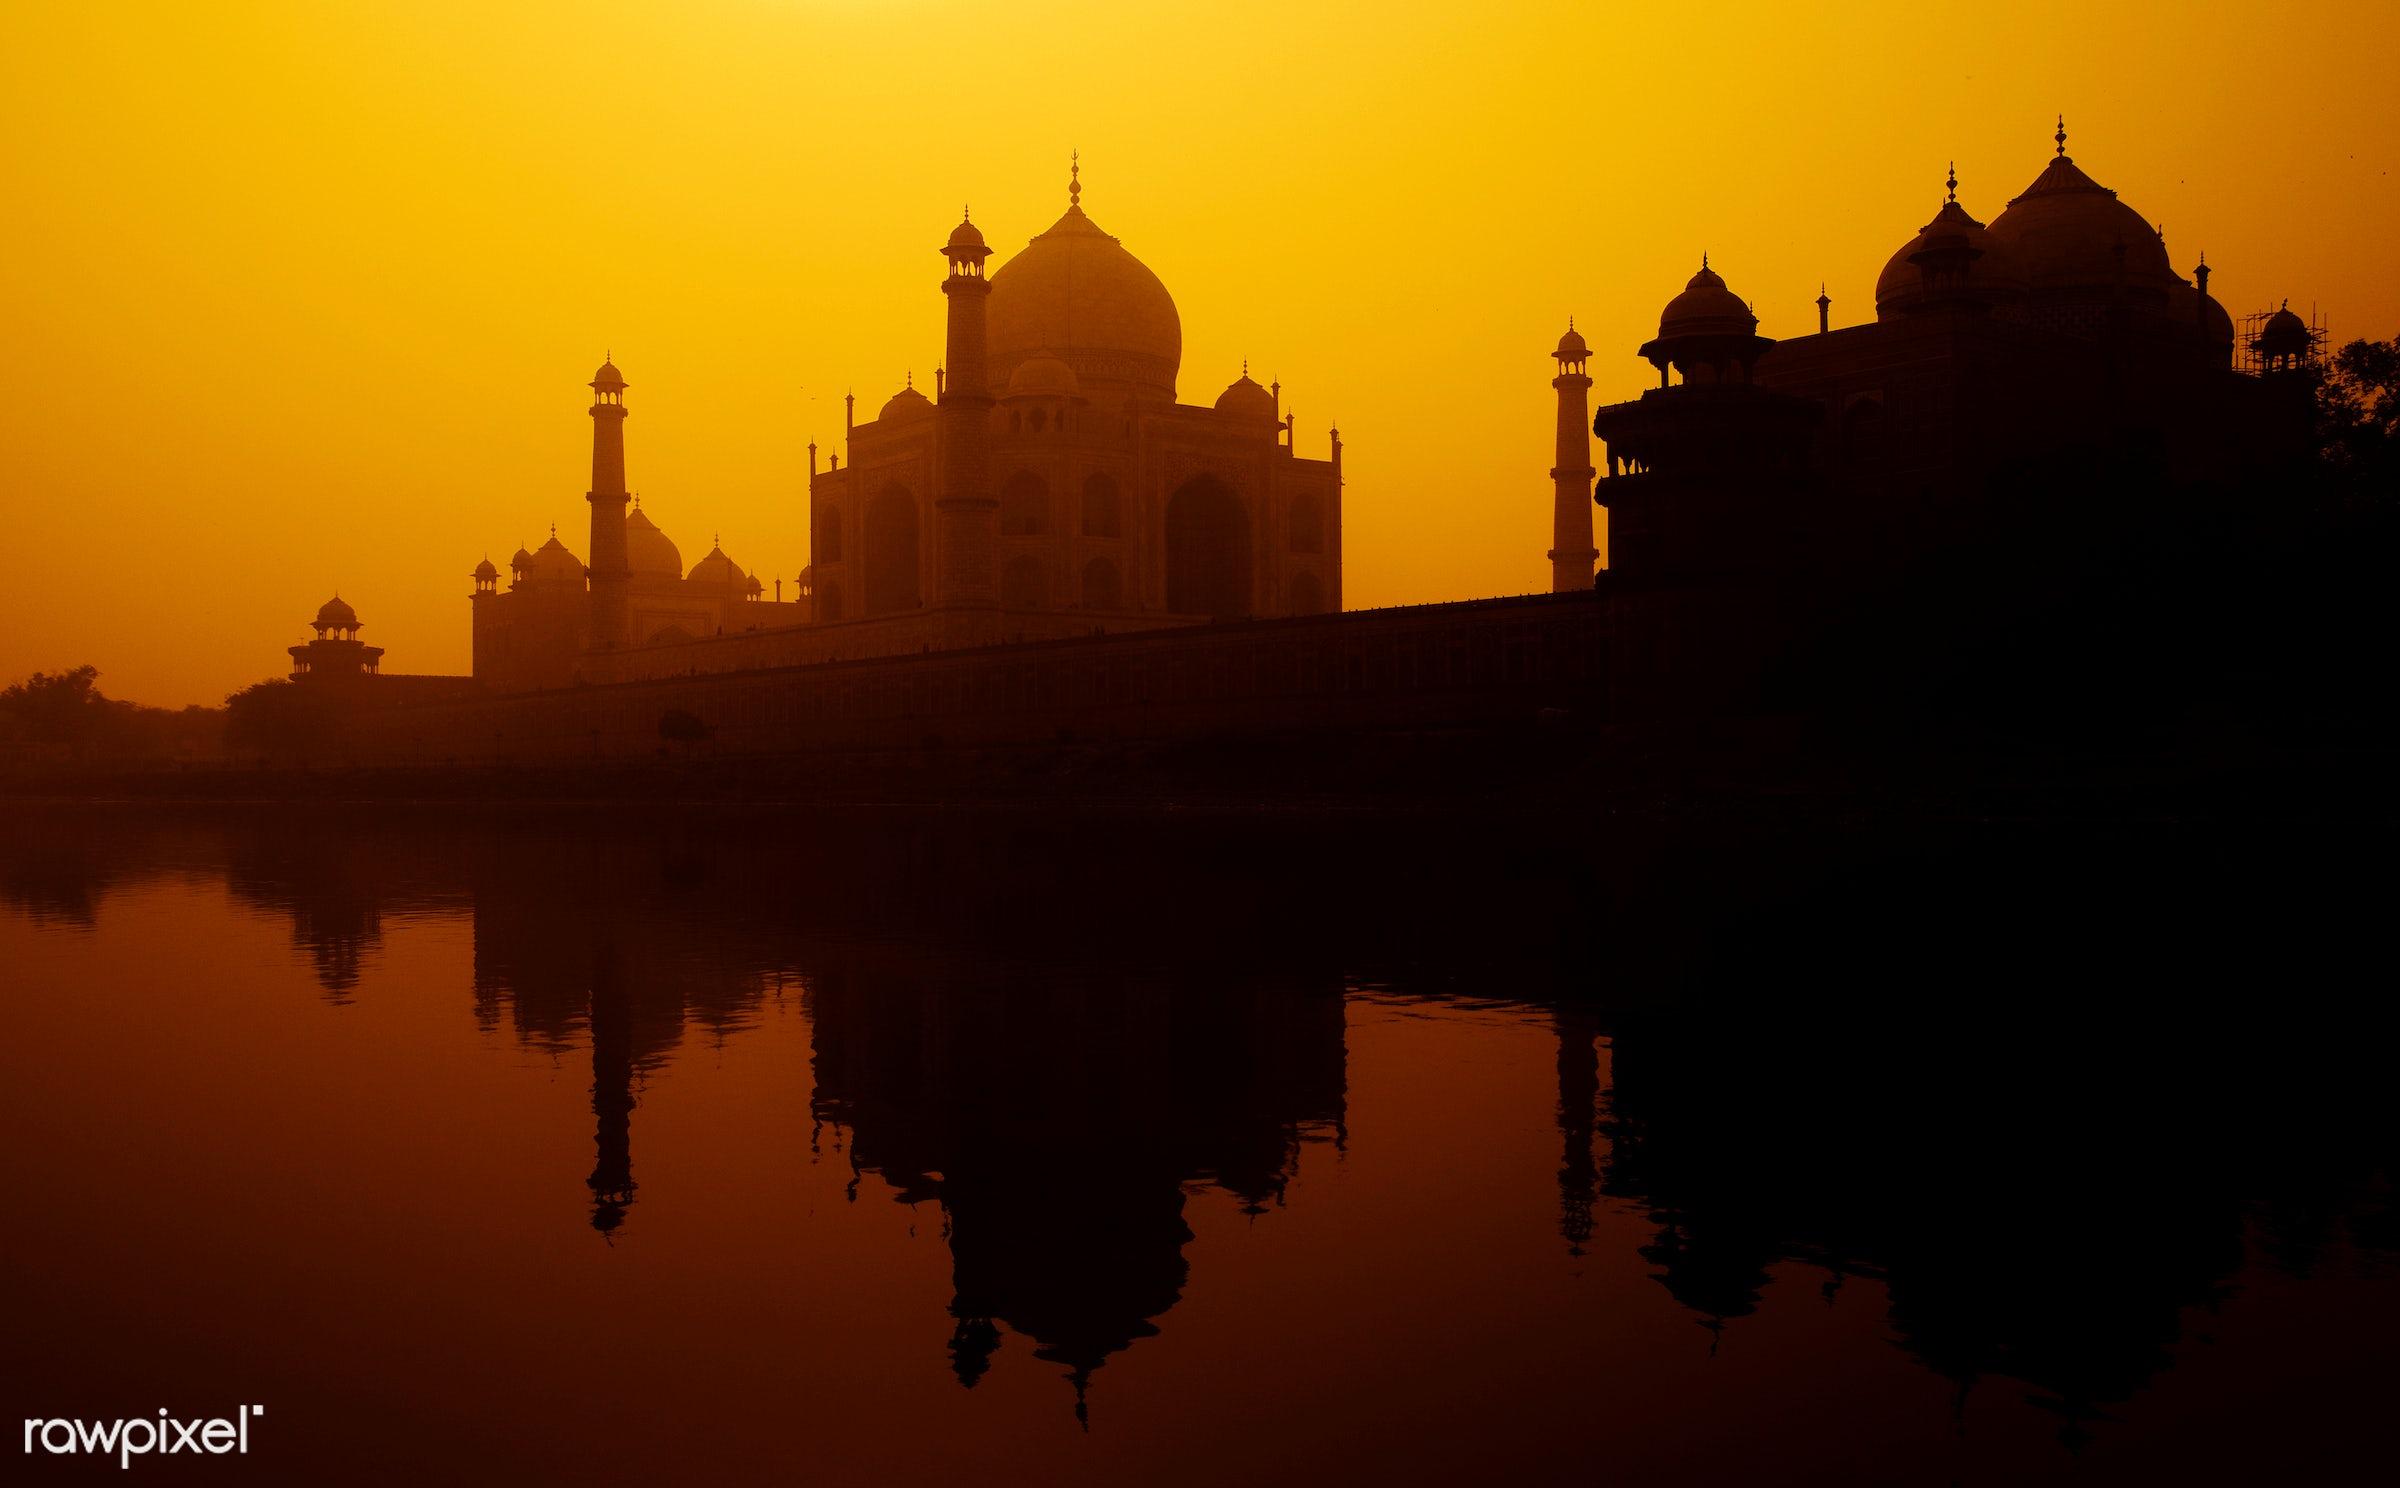 Sunset silhouette of a grand Taj Mahal - 7 wonders, architectural styles, architecture, architecture and buildings, asia,...